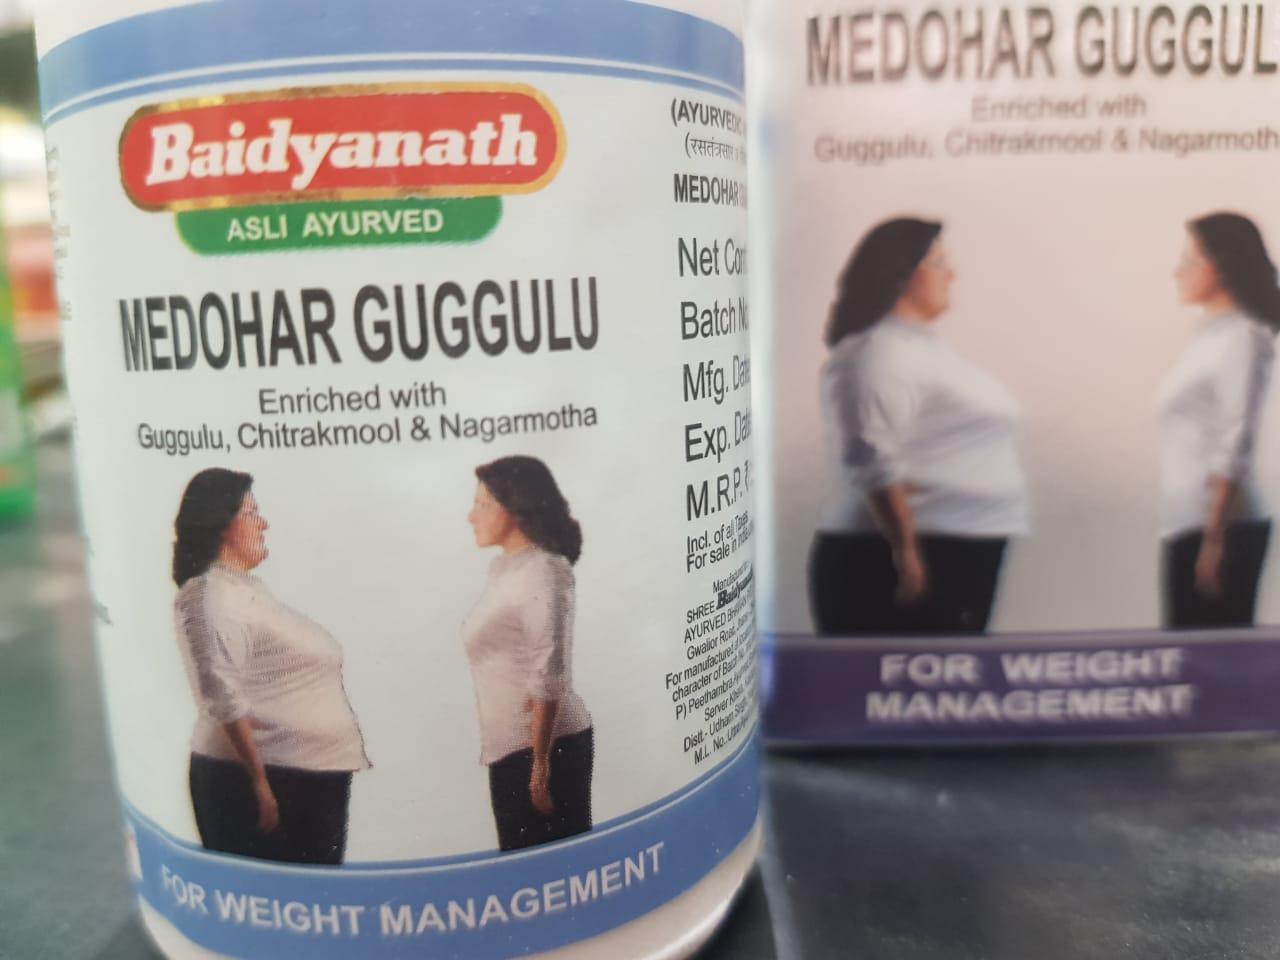 Baidyanath Medohar Guggulu -Awesome product-By poonam_kakkar